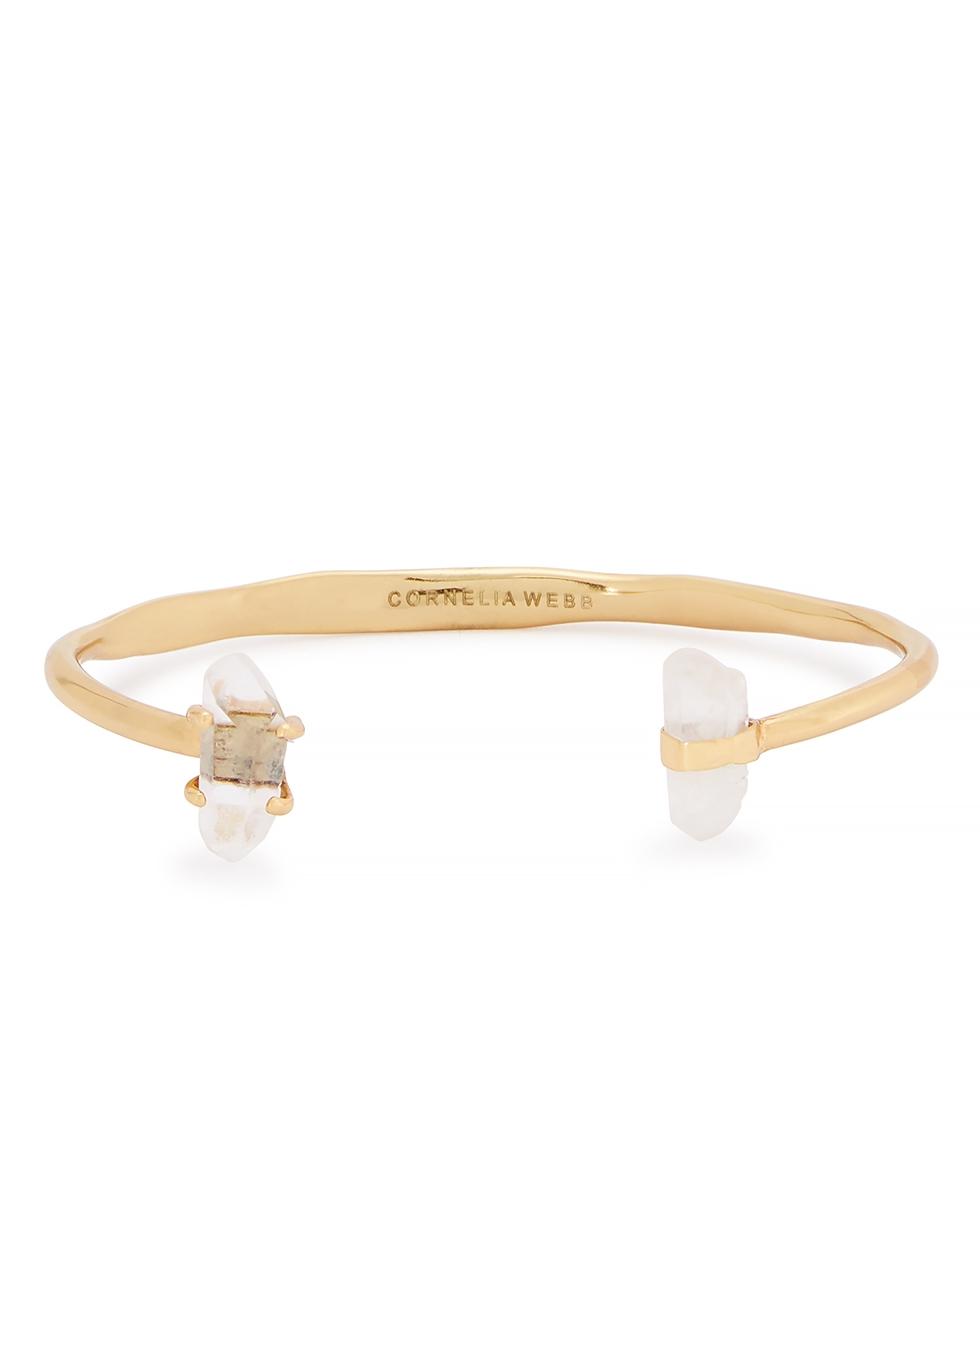 Crystalised gold-plated bracelet